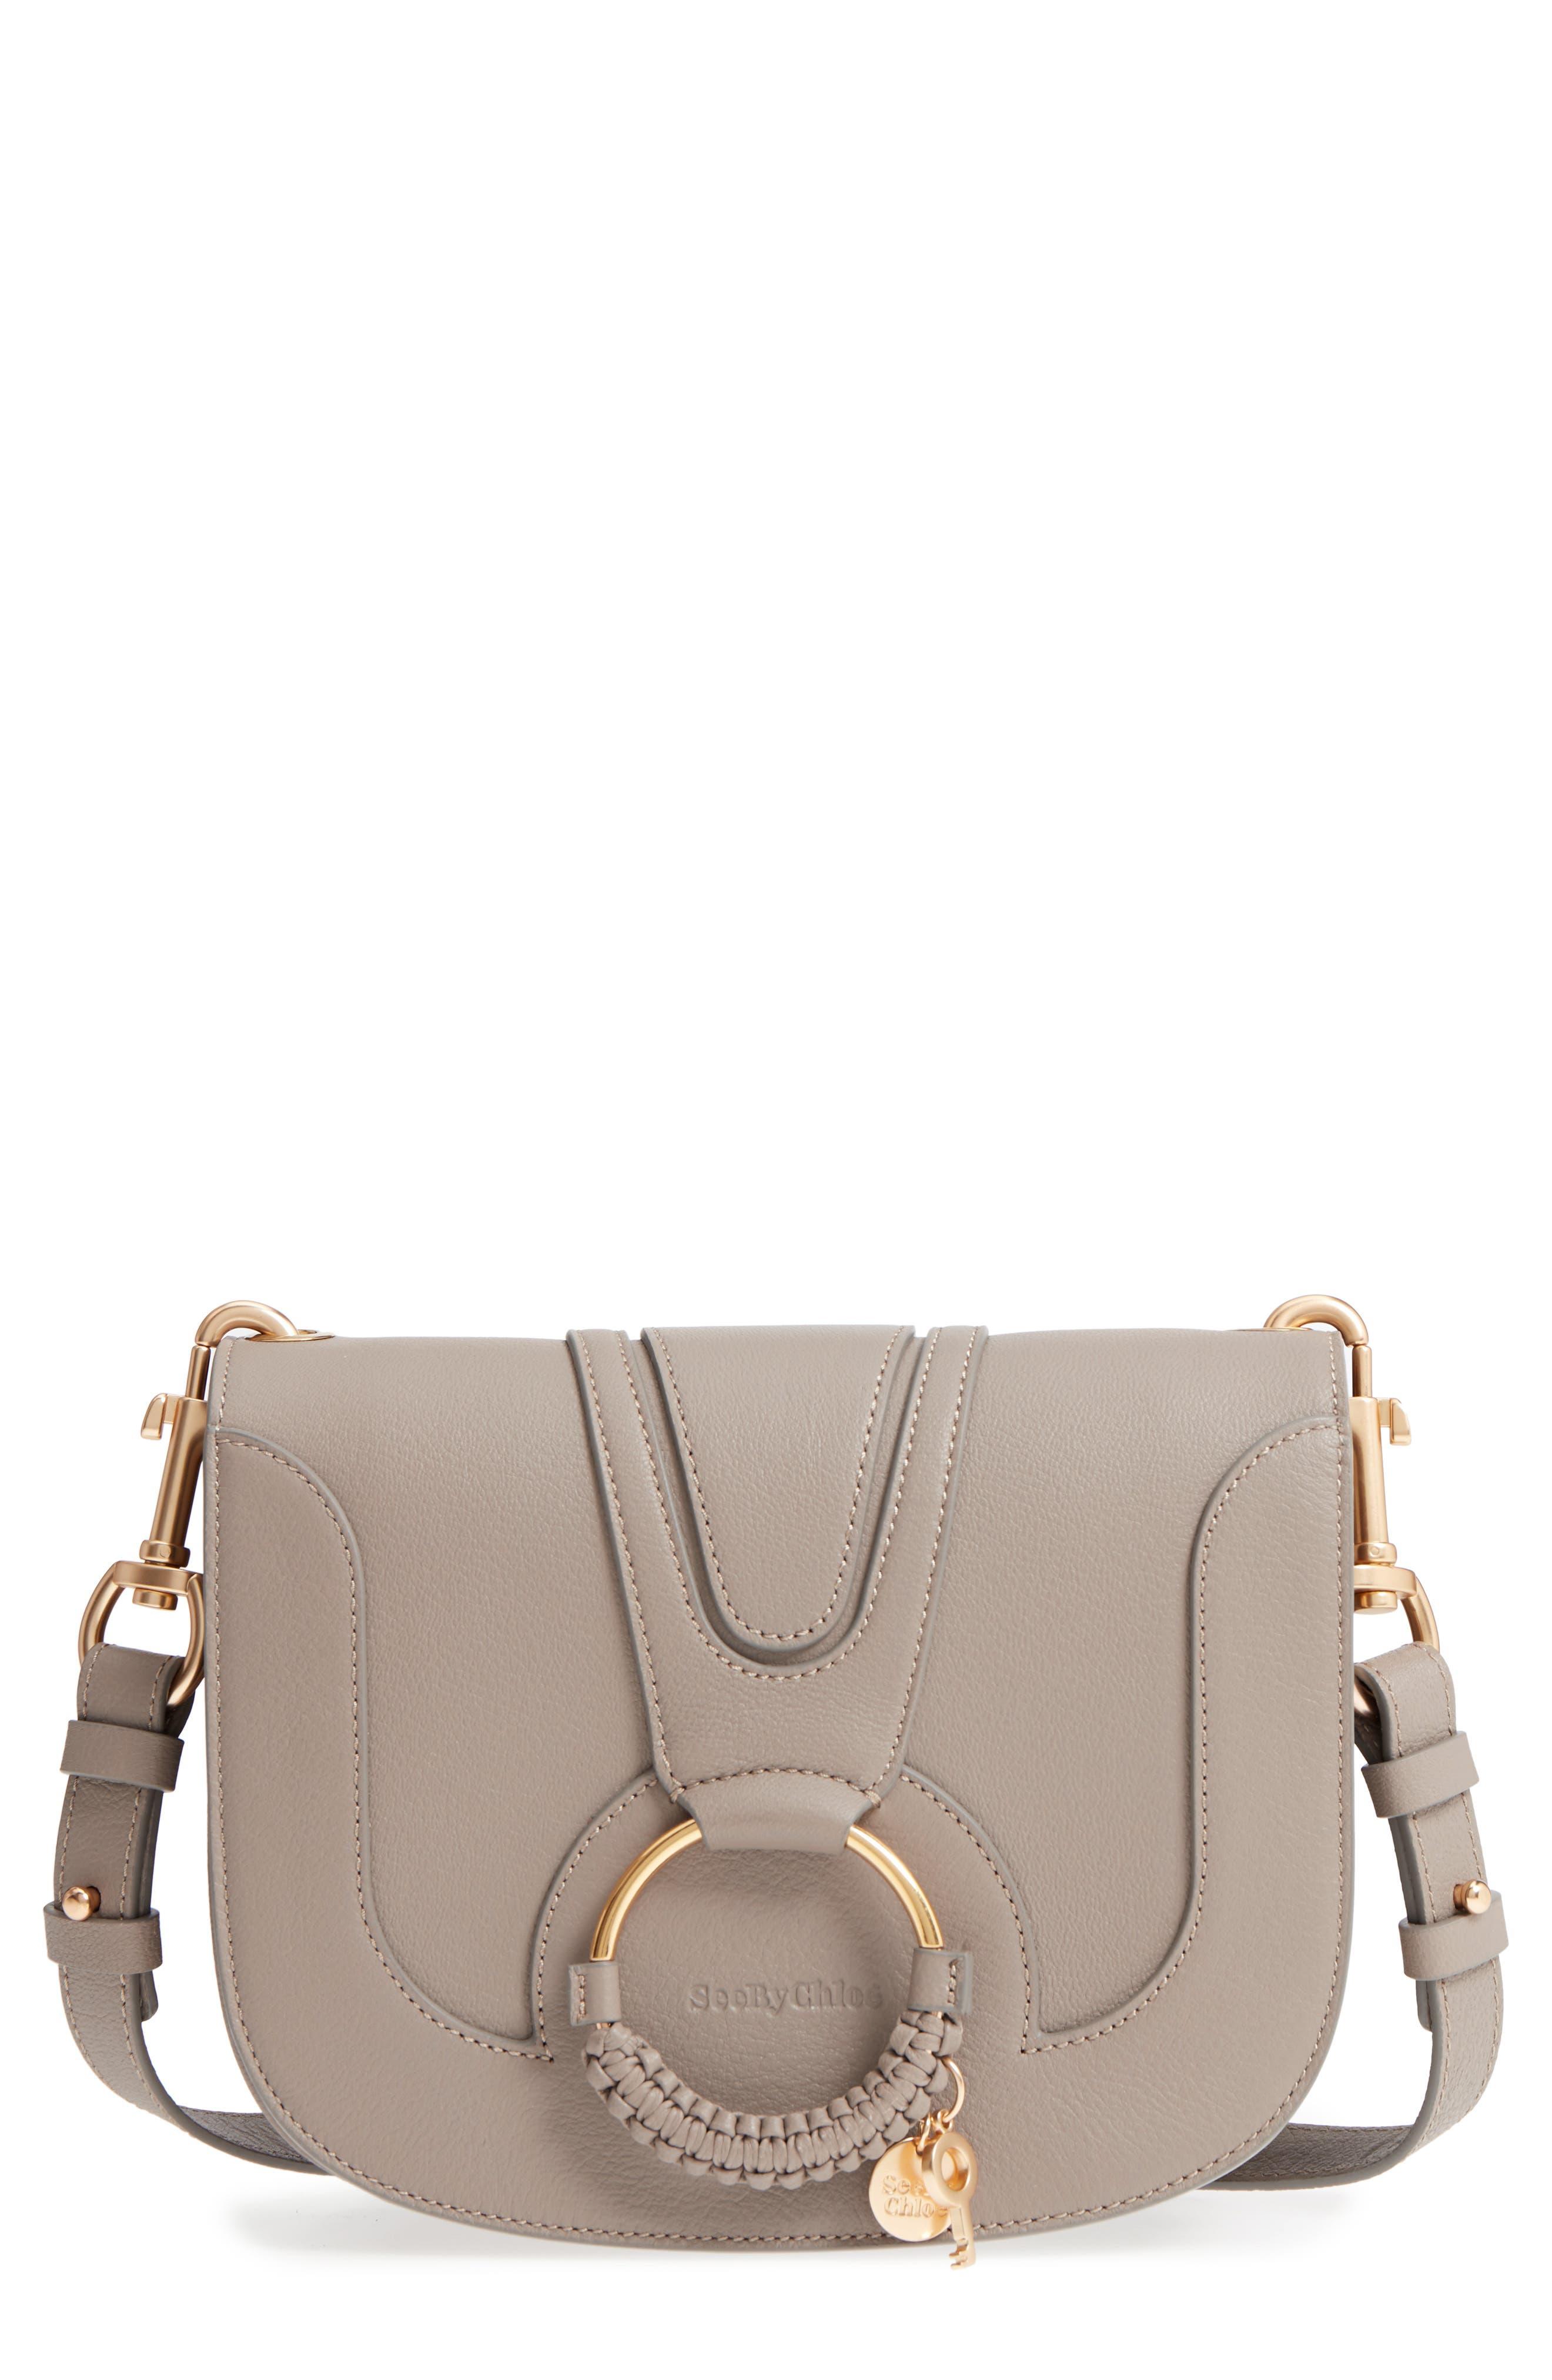 Hana Small Leather Crossbody Bag,                             Main thumbnail 1, color,                             Motty Grey